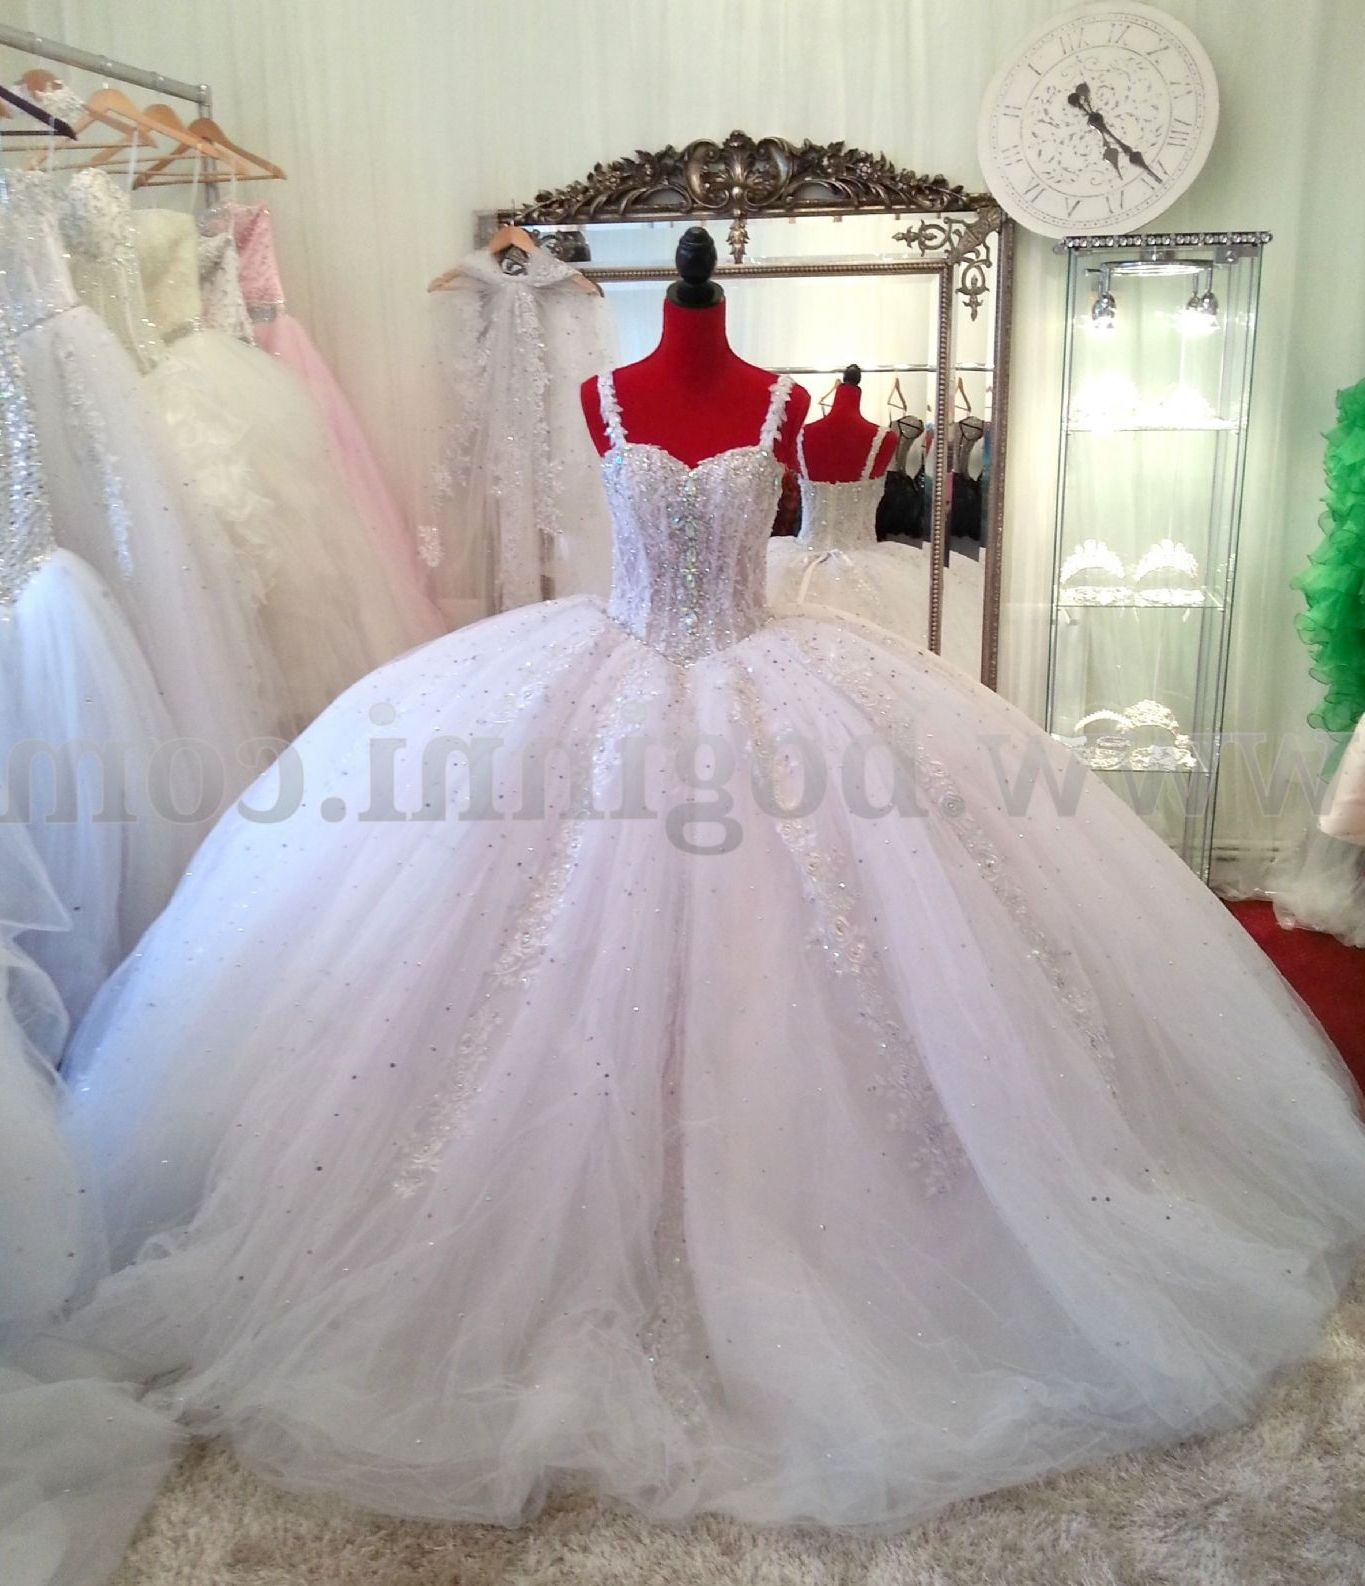 Big White Wedding Dresses With Diamonds Ball Gowns Wedding Ball Gowns Bridal Dresses [ 1586 x 1365 Pixel ]